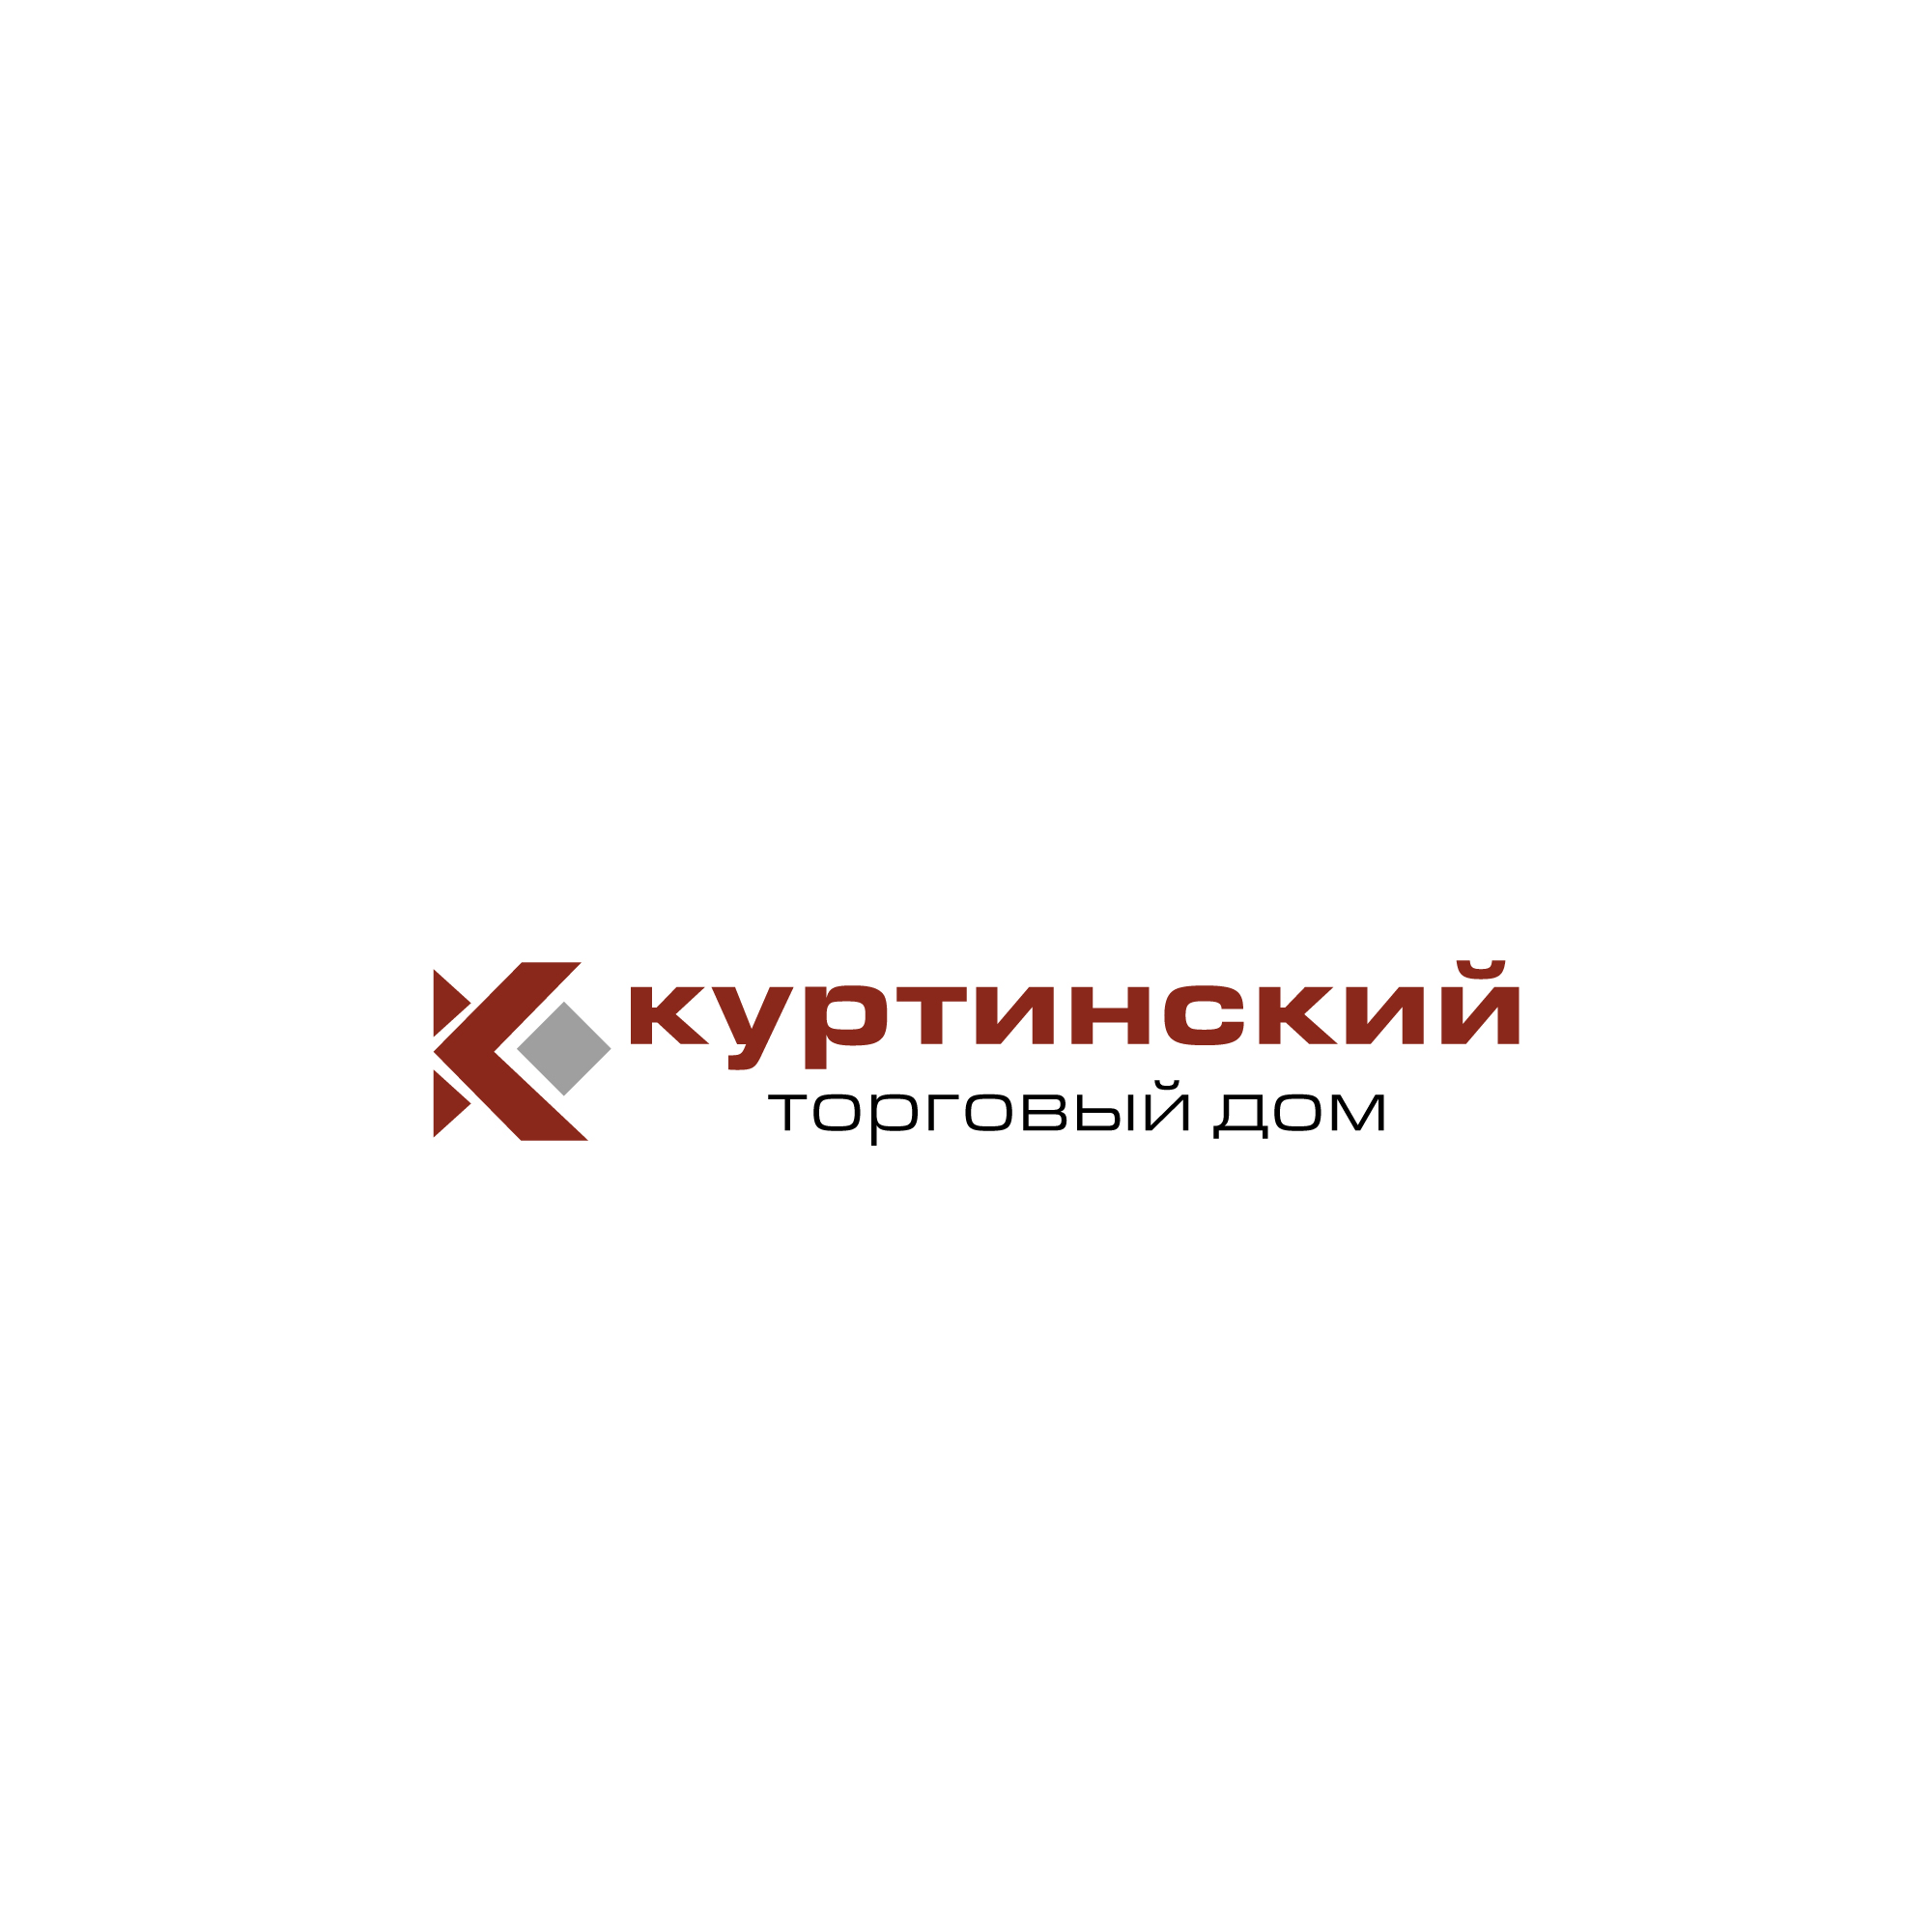 Логотип для камнедобывающей компании фото f_9015ba04bc6c53e5.jpg